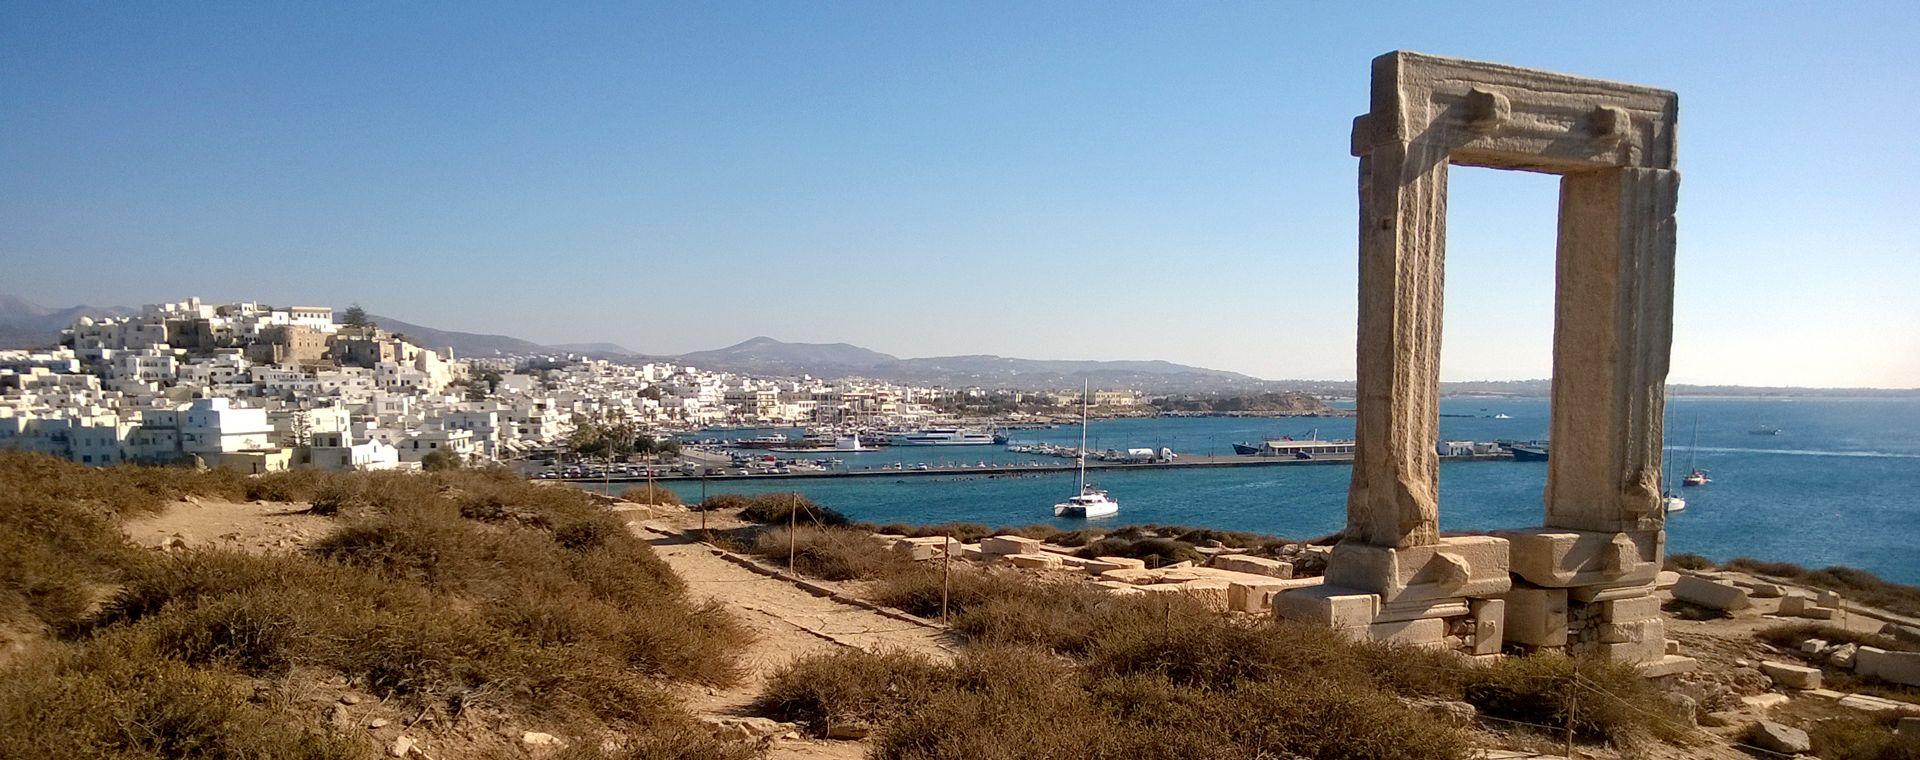 Image Cyclades orientales : Santorin, Naxos et Amorgos